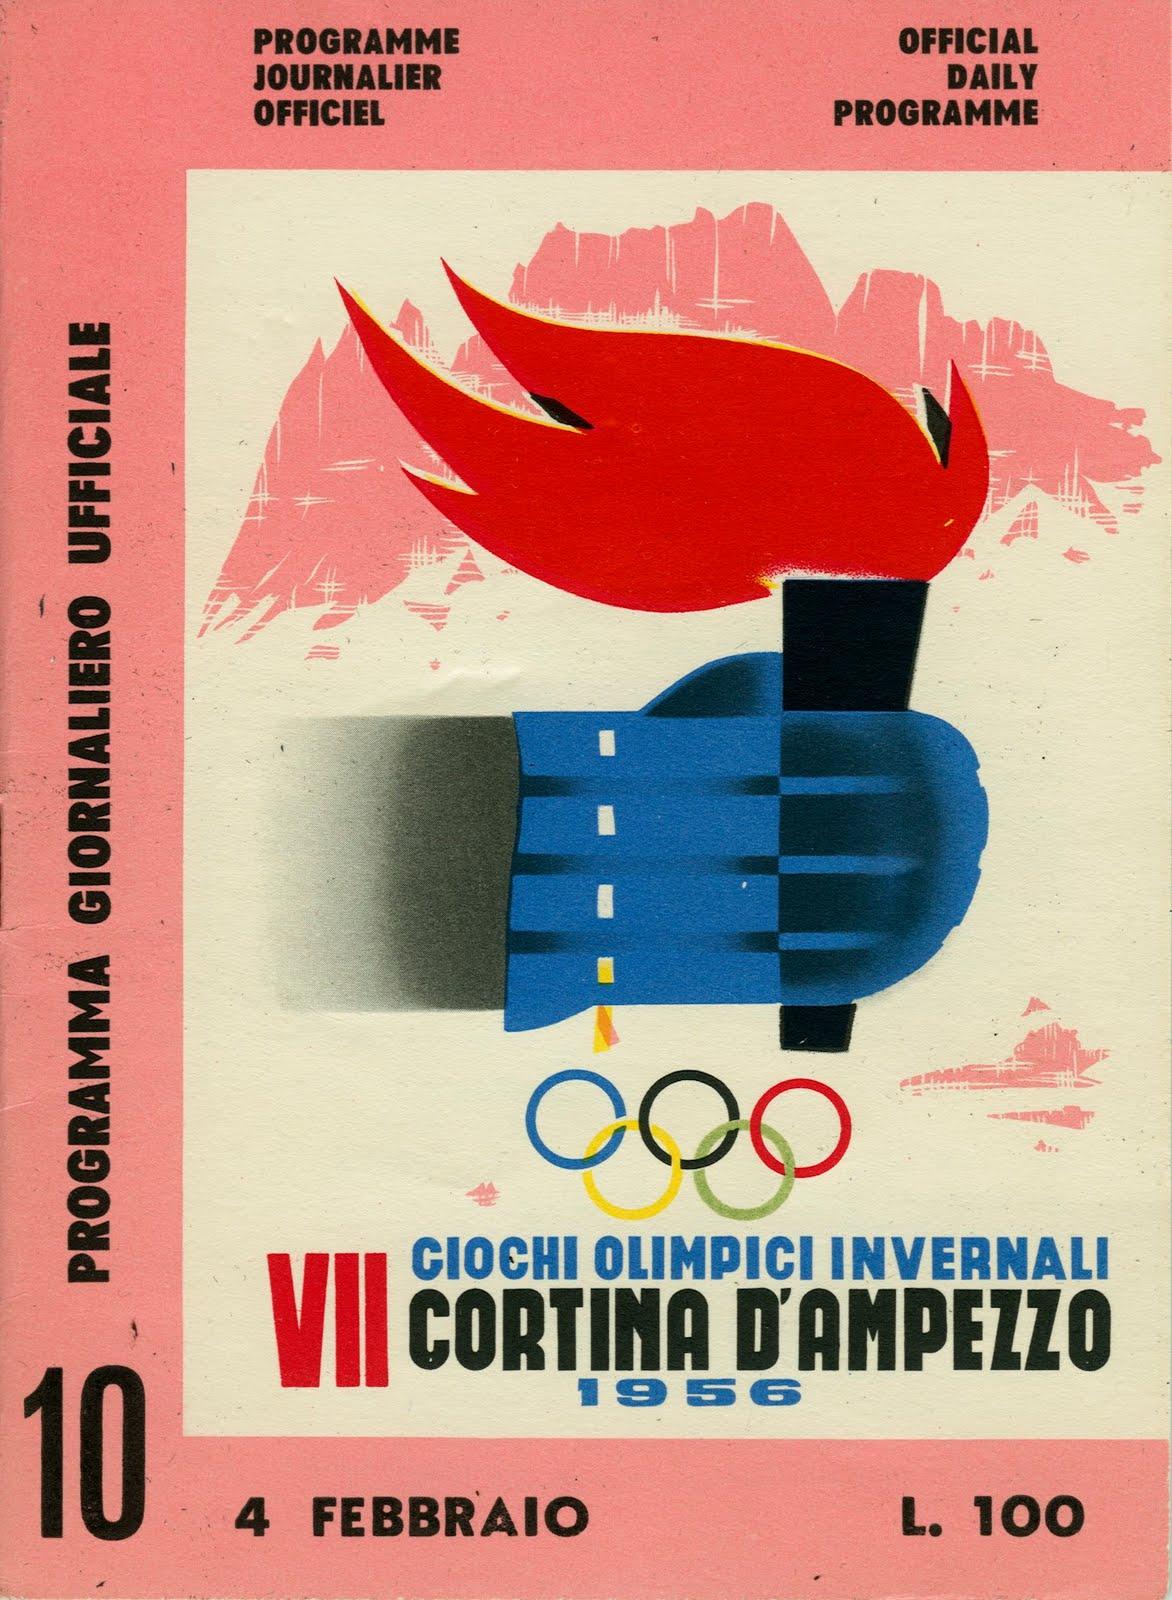 1956-Winter-Olympic-Games-Italy-Cortina-dAmpezzo